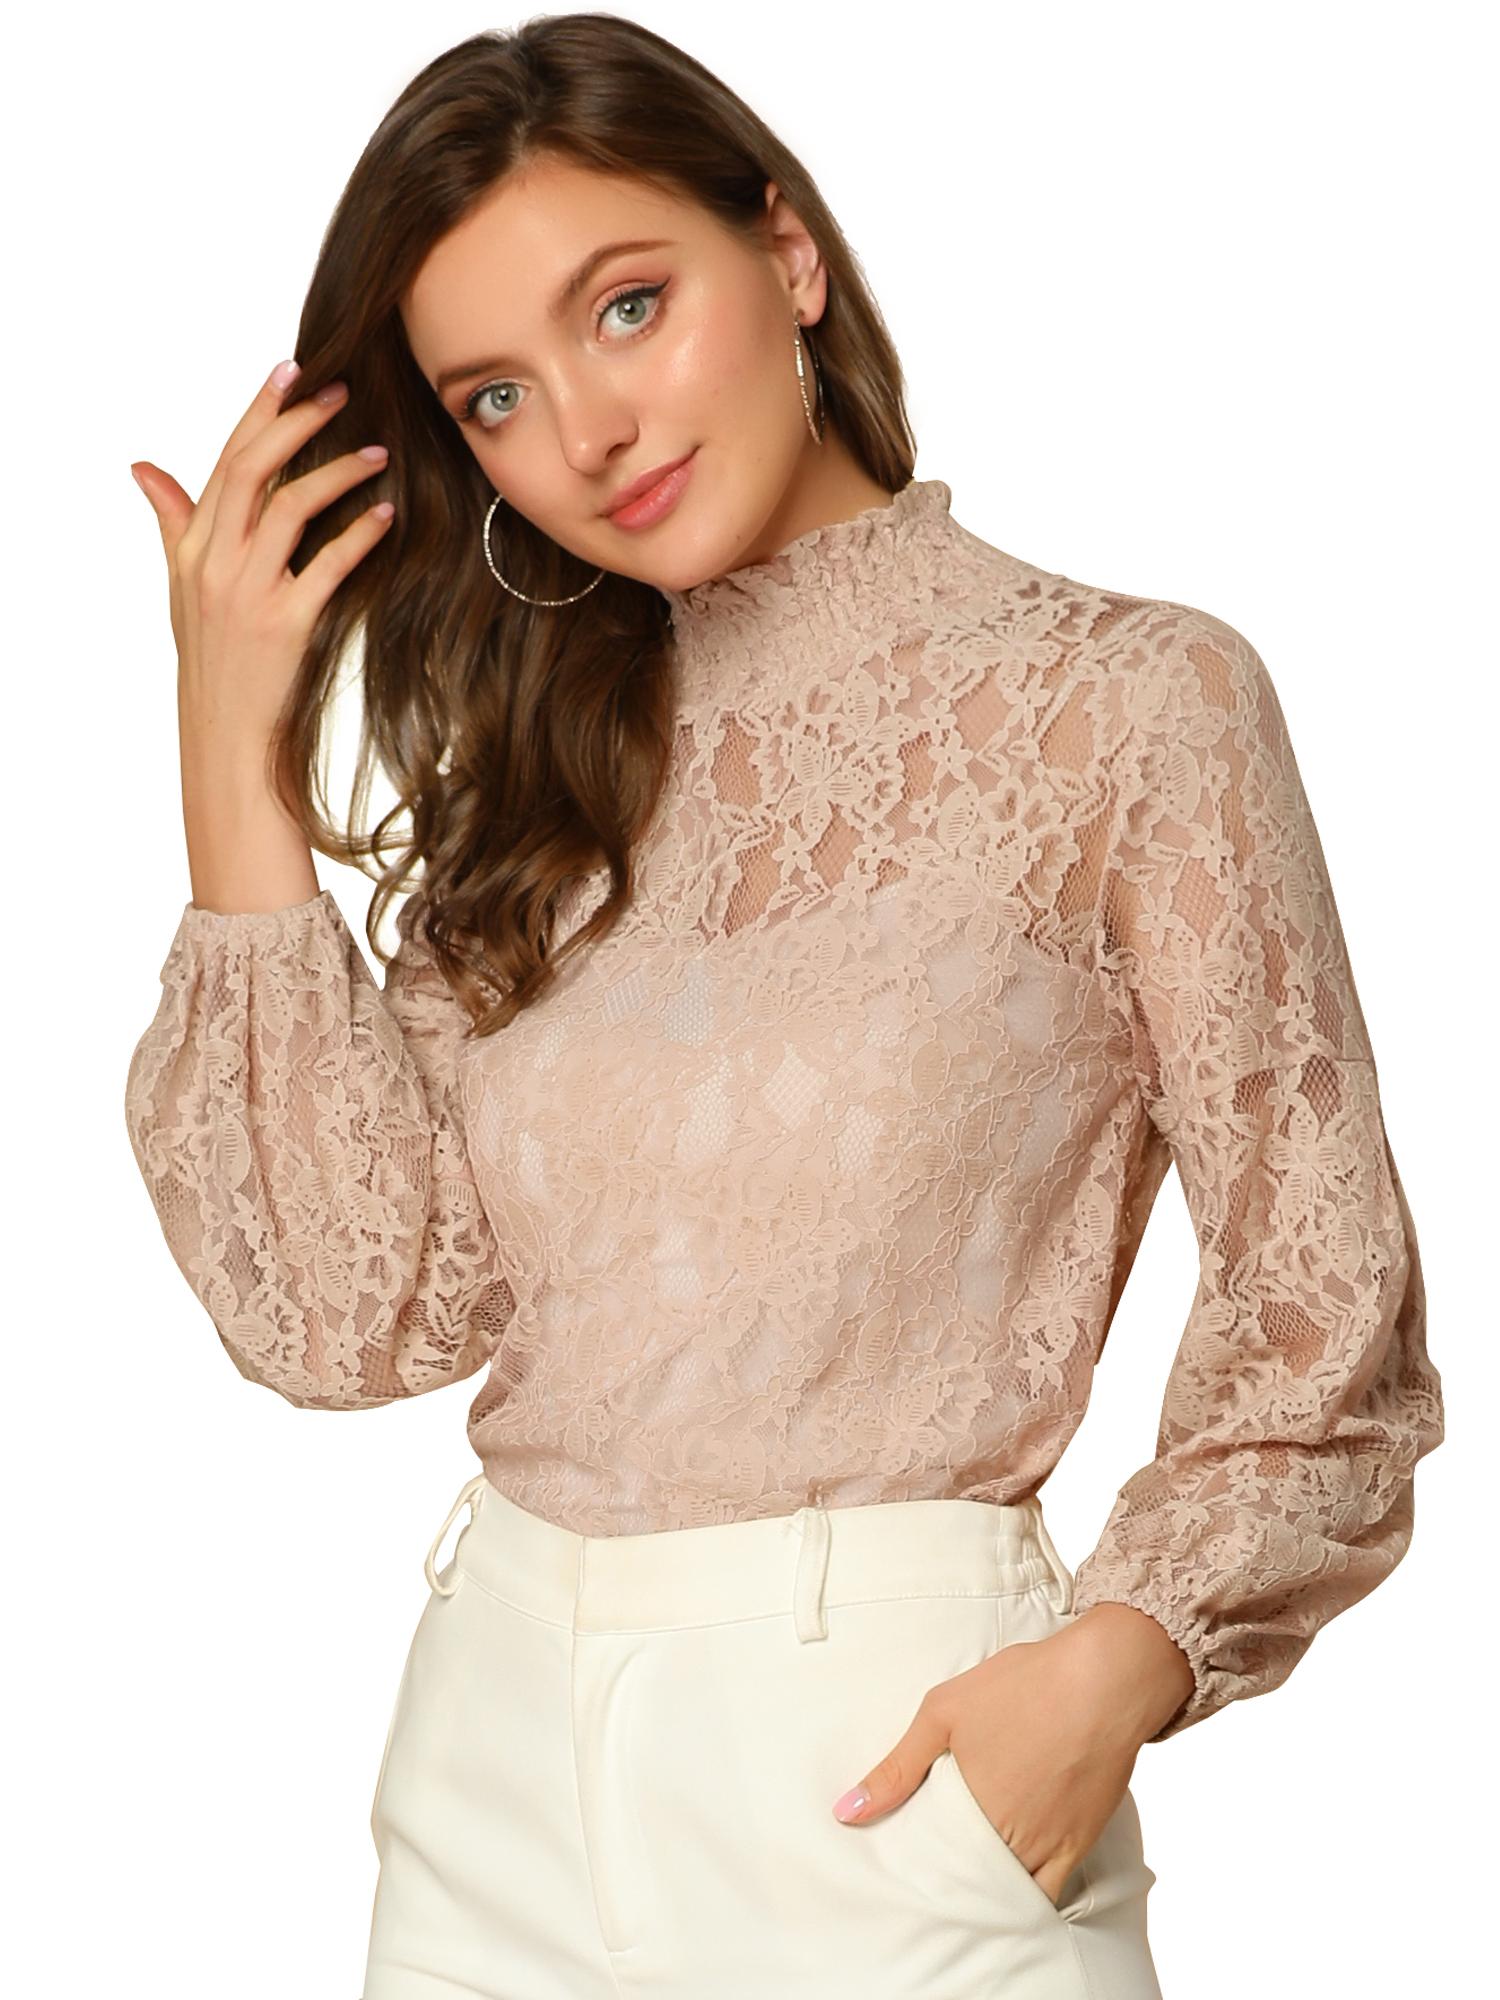 Allegra K Women's Lace Sheer Long Sleeves Vintage Tops Blouse Pink XS